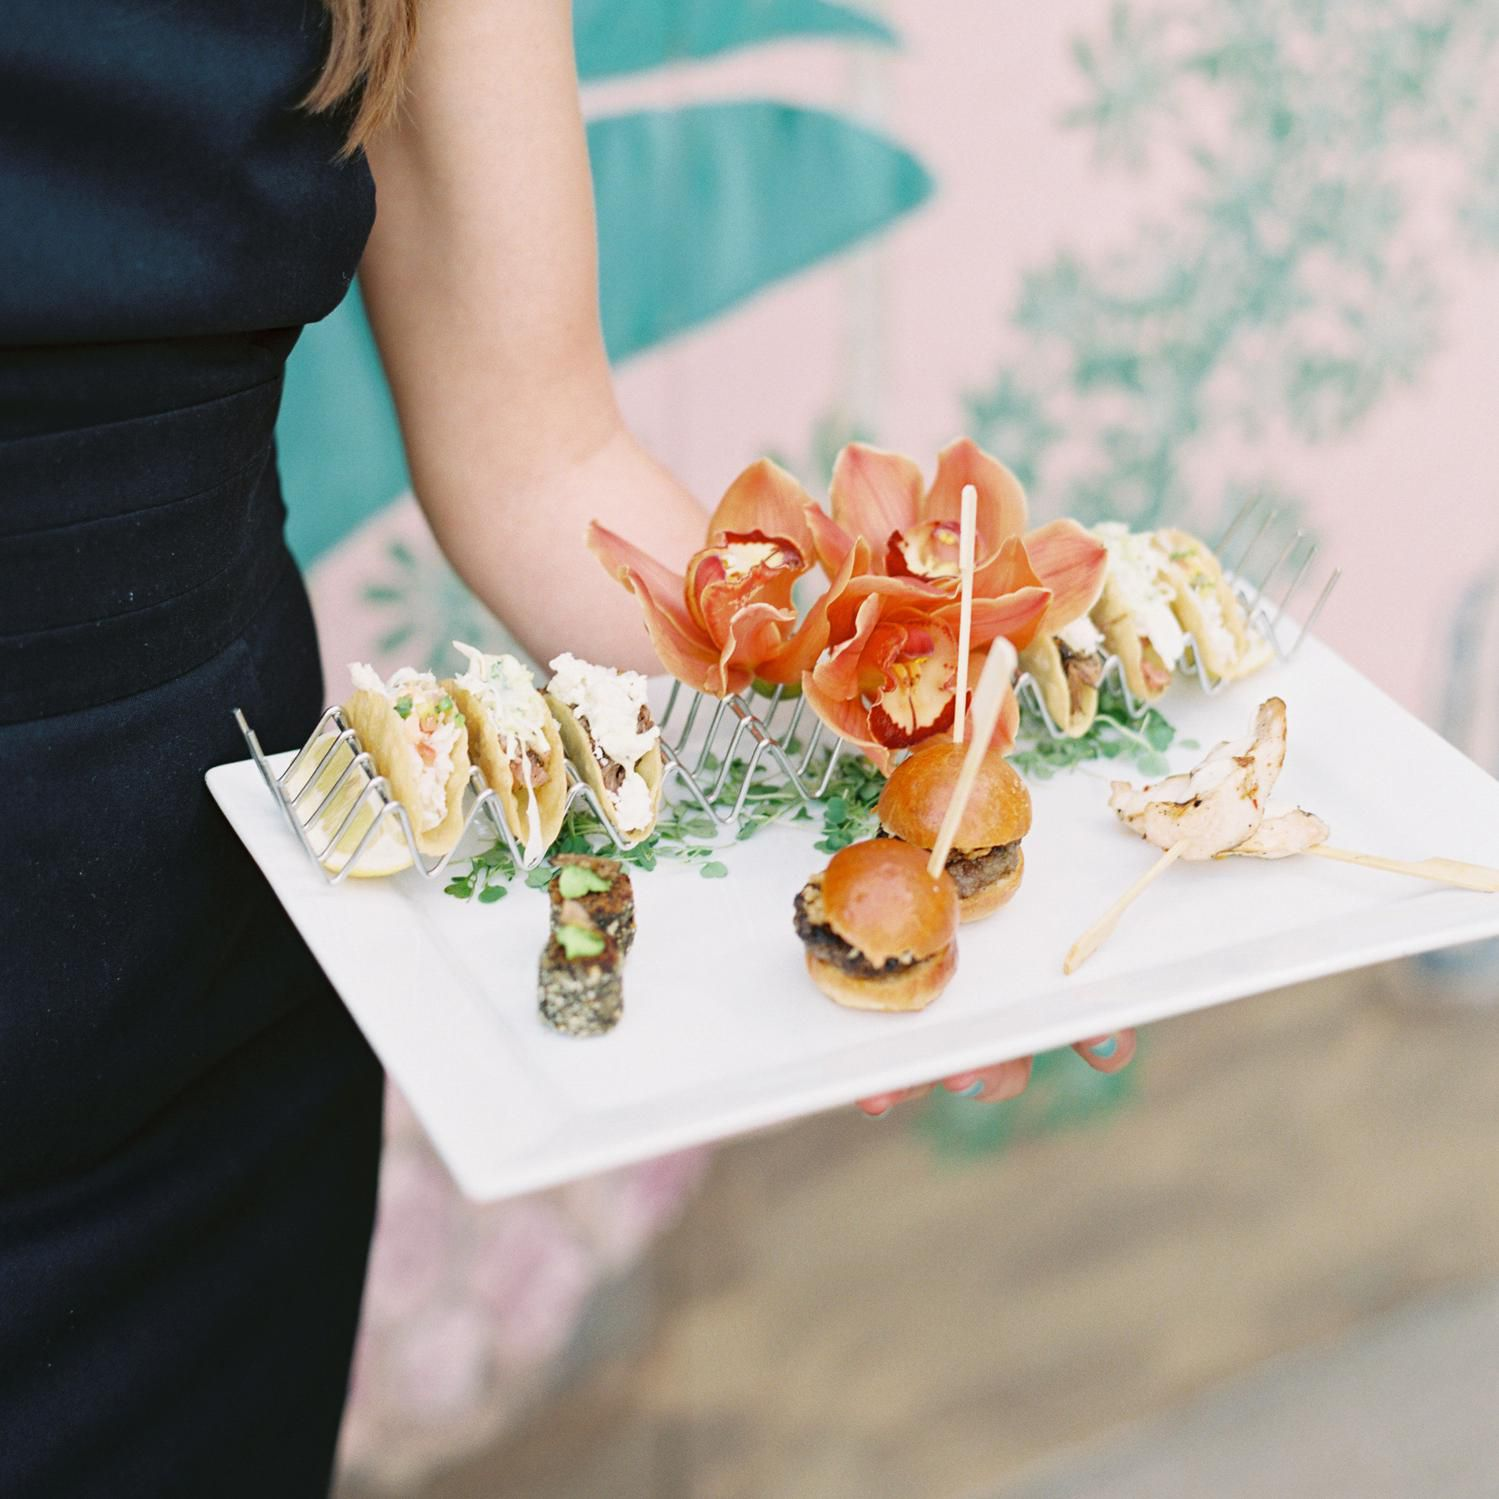 11 Mouth Watering Wedding Menu Ideas For A Summer Wedding